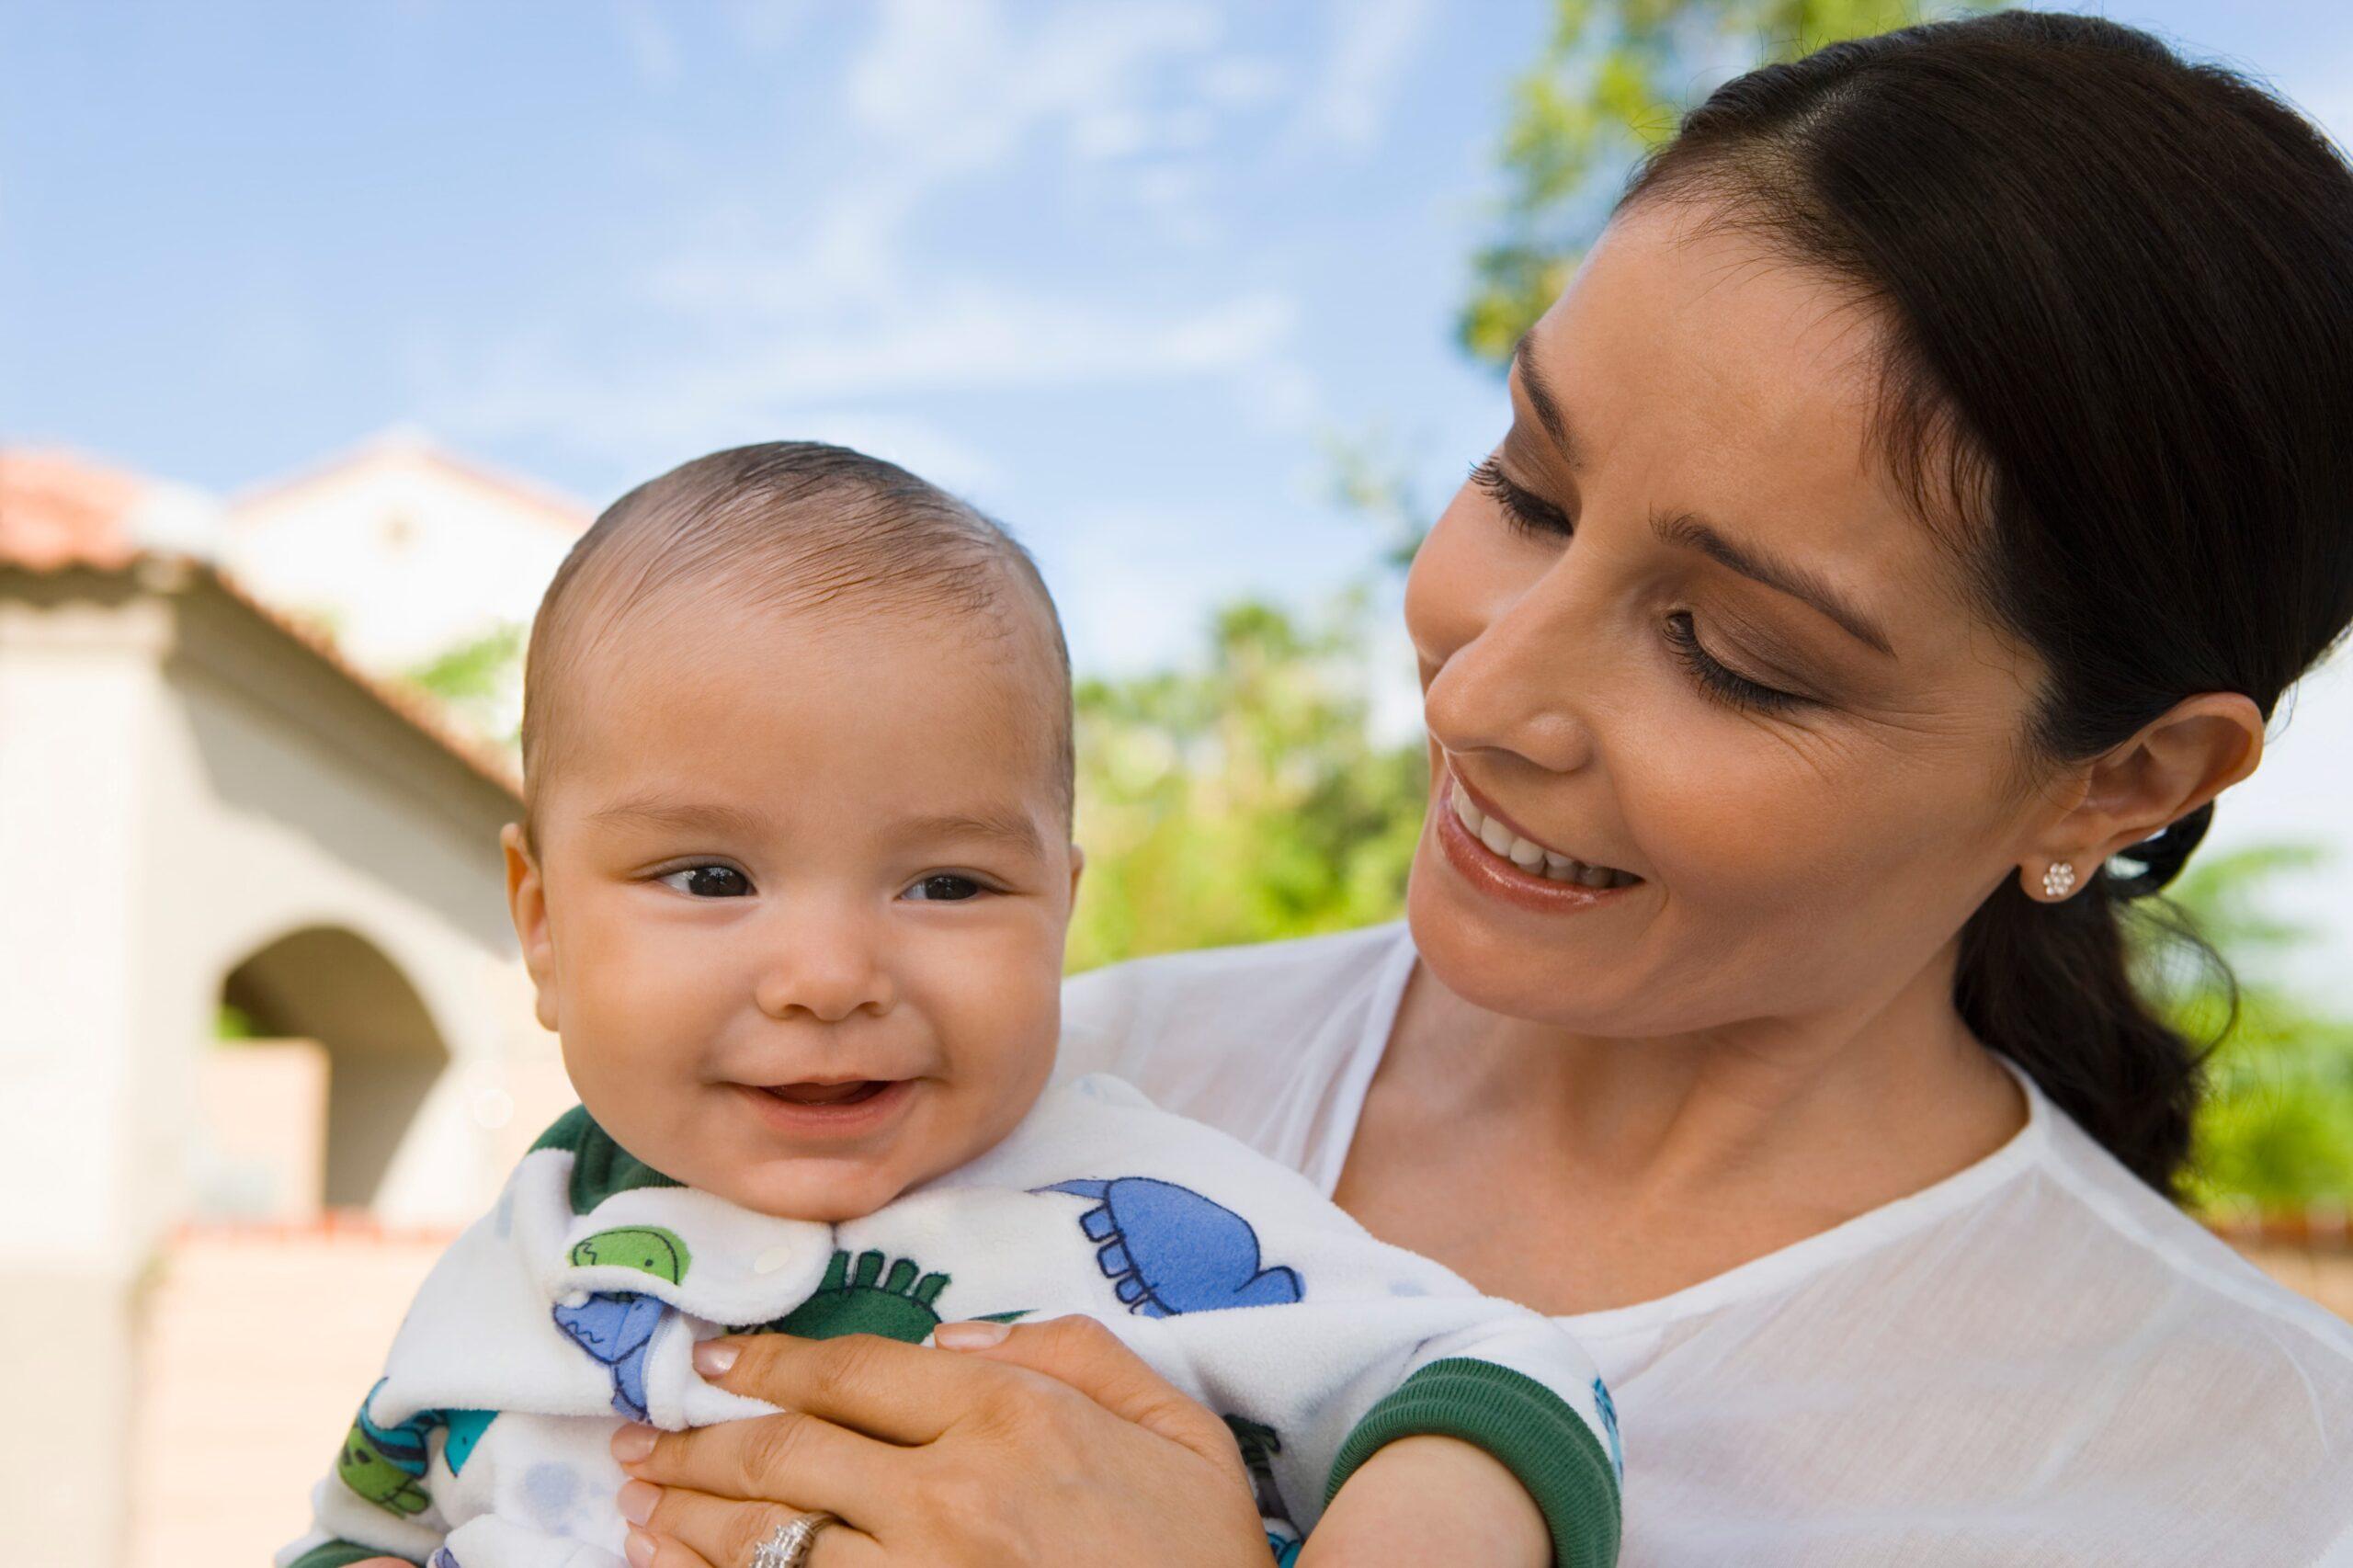 independence during motherhood